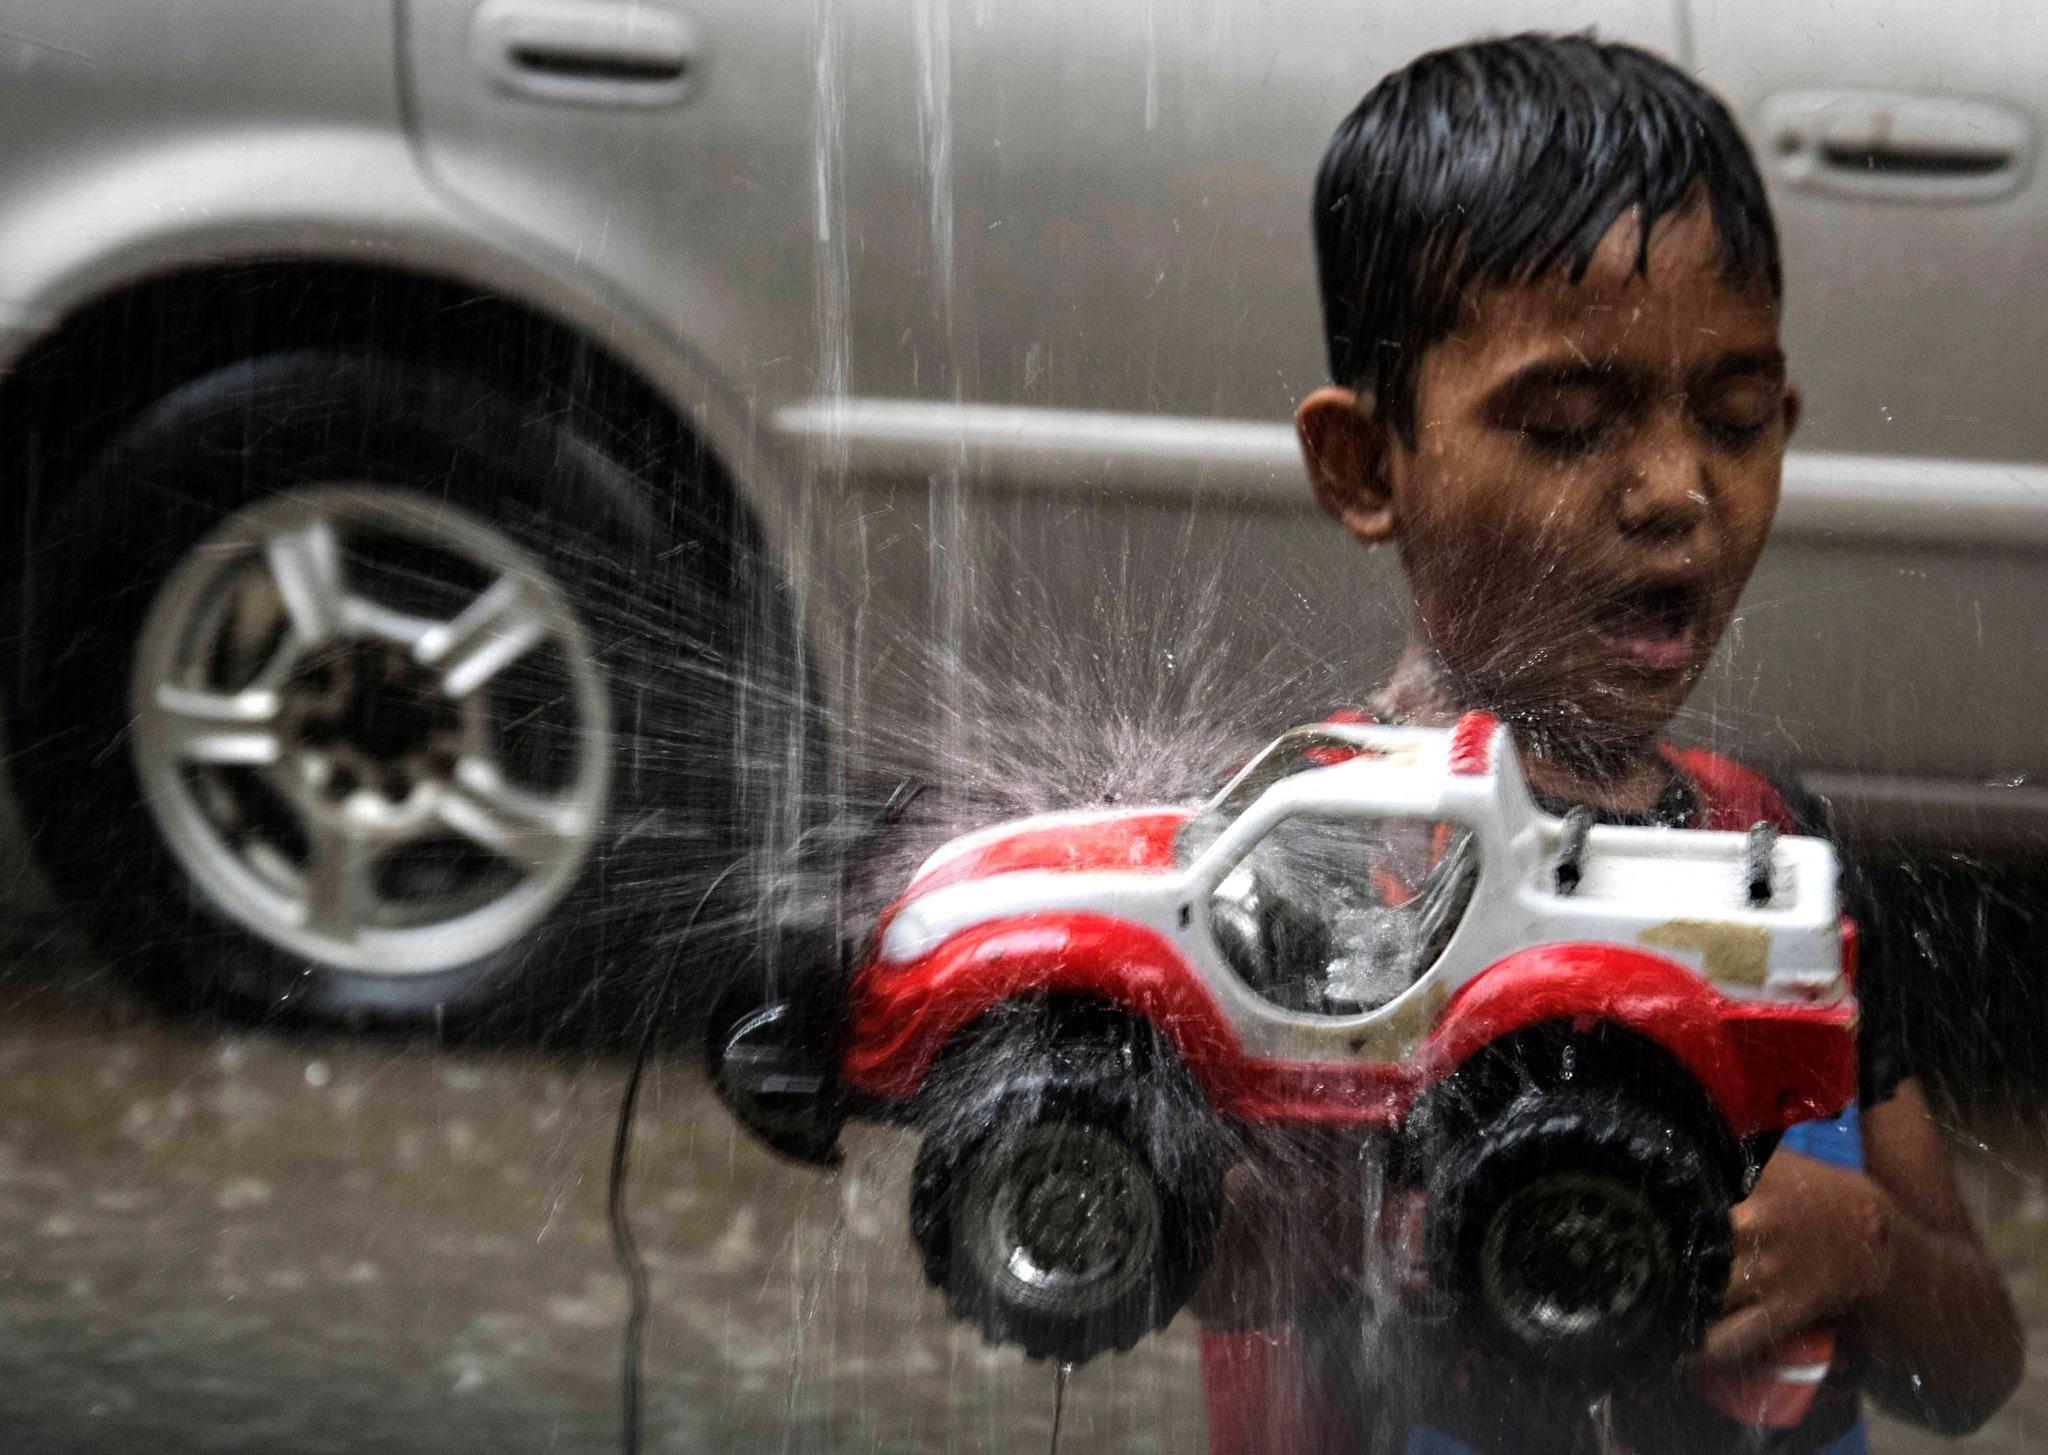 4 wheel drive in Rain by alinoton